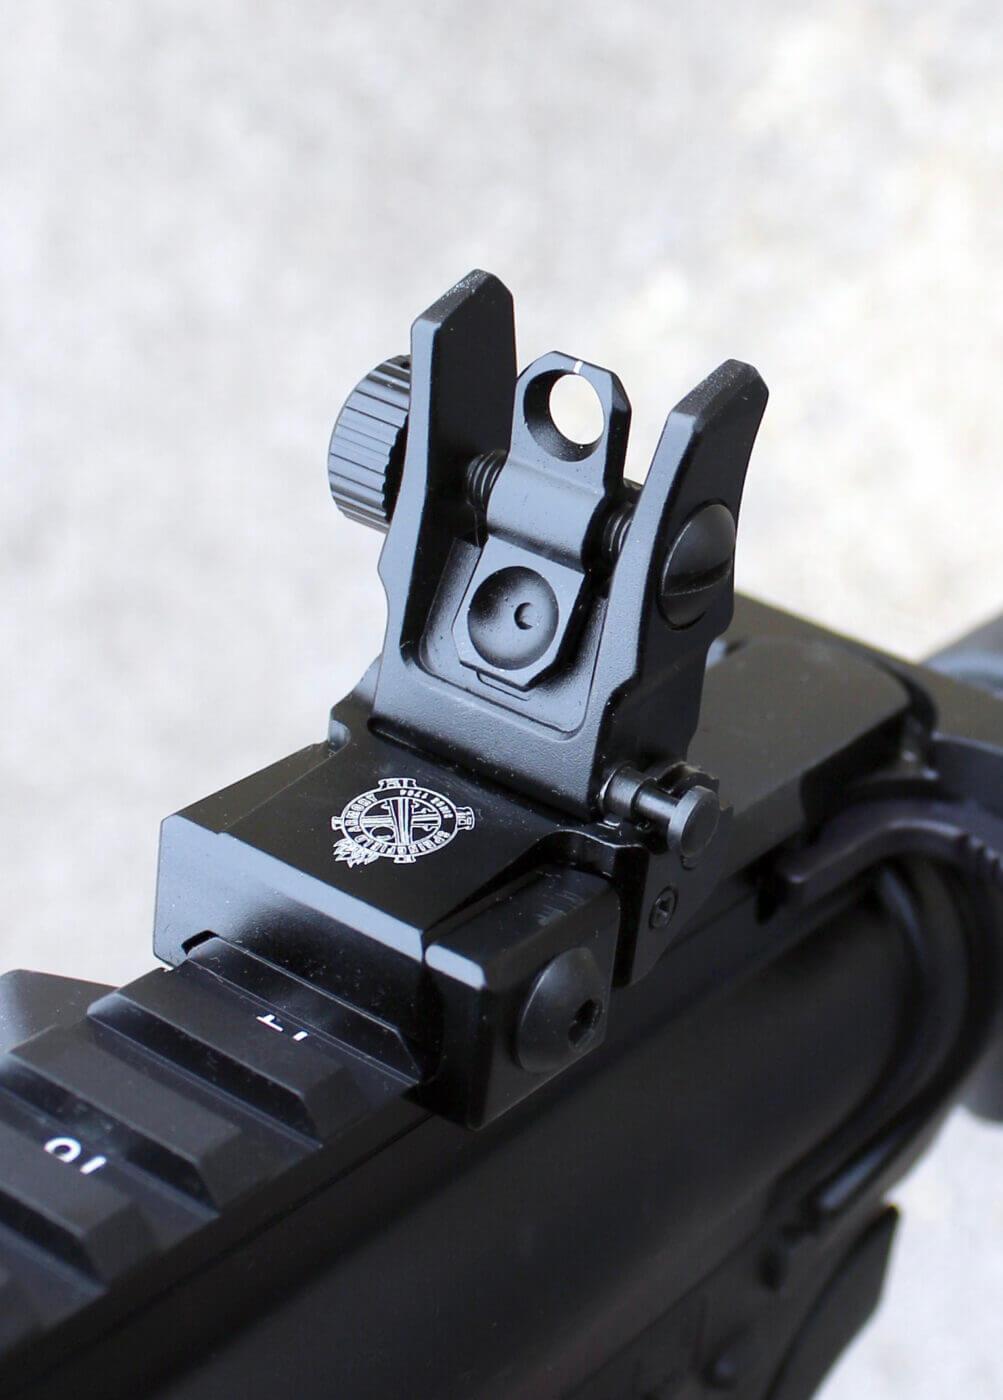 Springfield SAINT rear sight